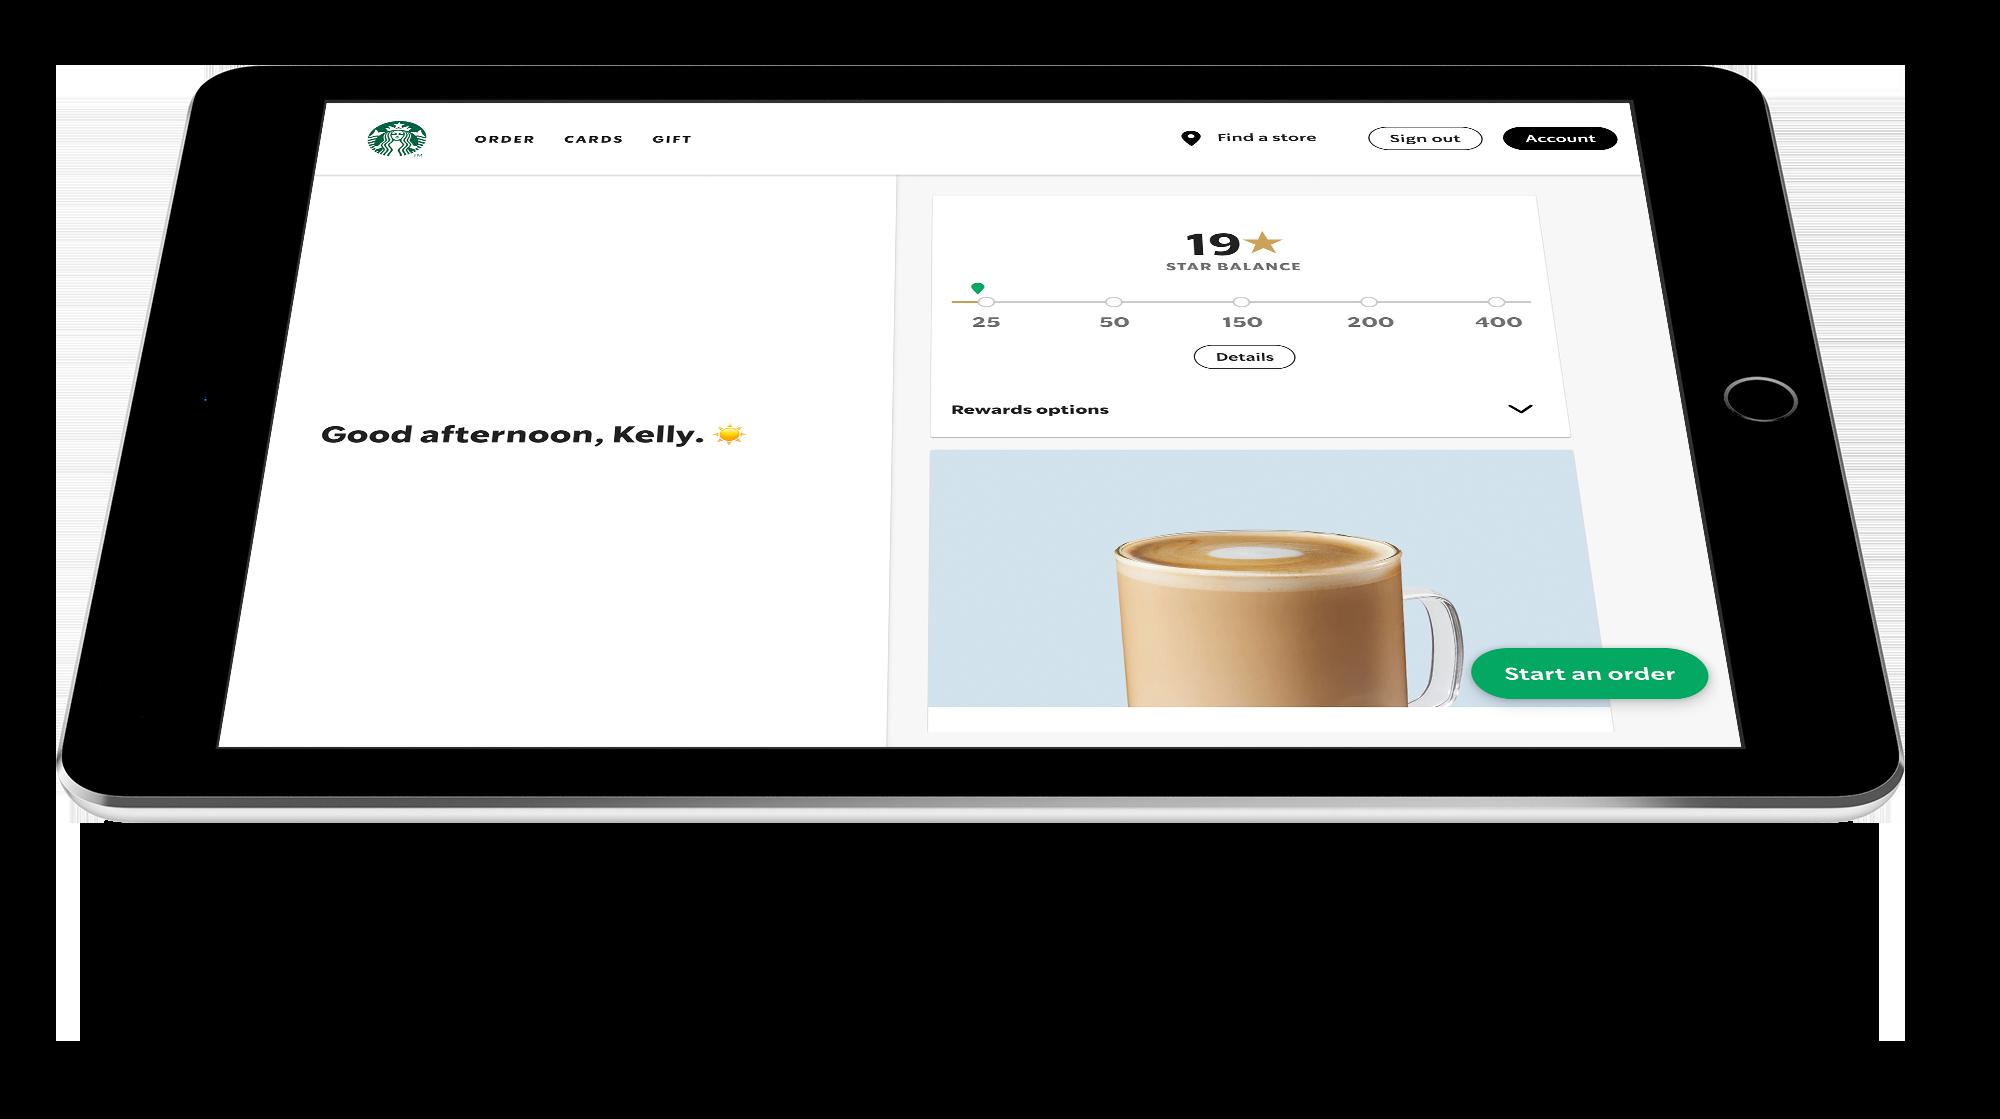 Image of Starbucks app on an iPad.